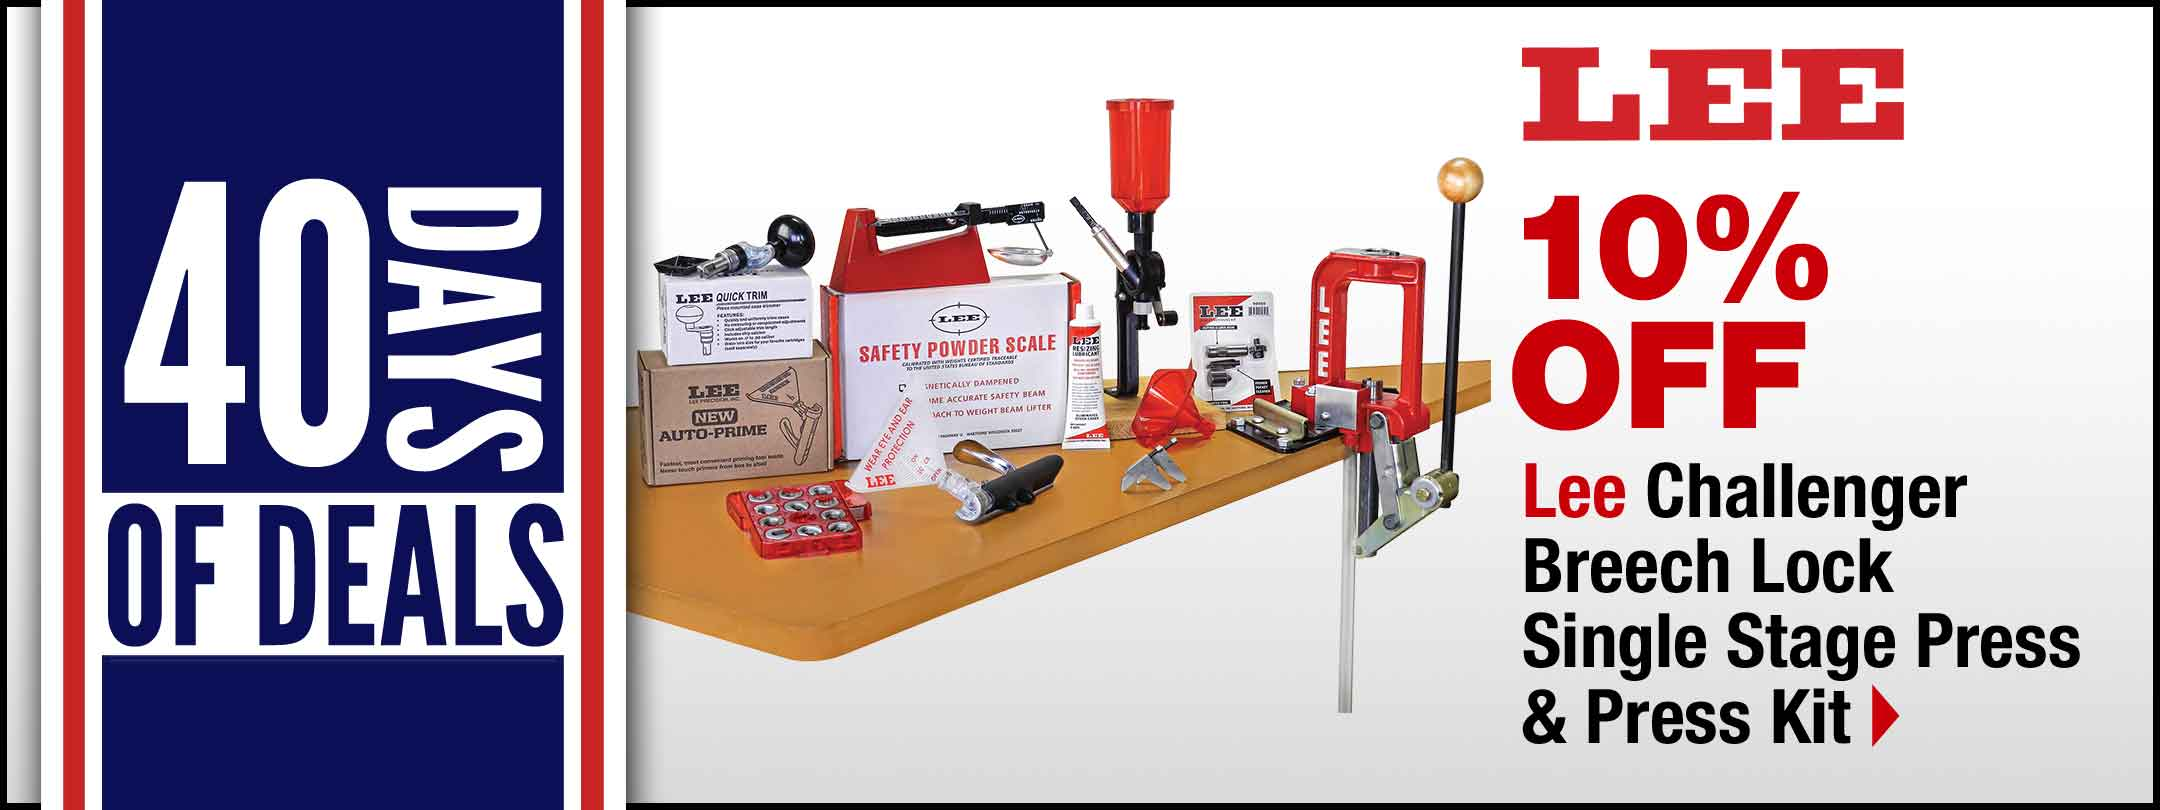 Lee Challenger Breech Lock Single Stage Press & Press Kit